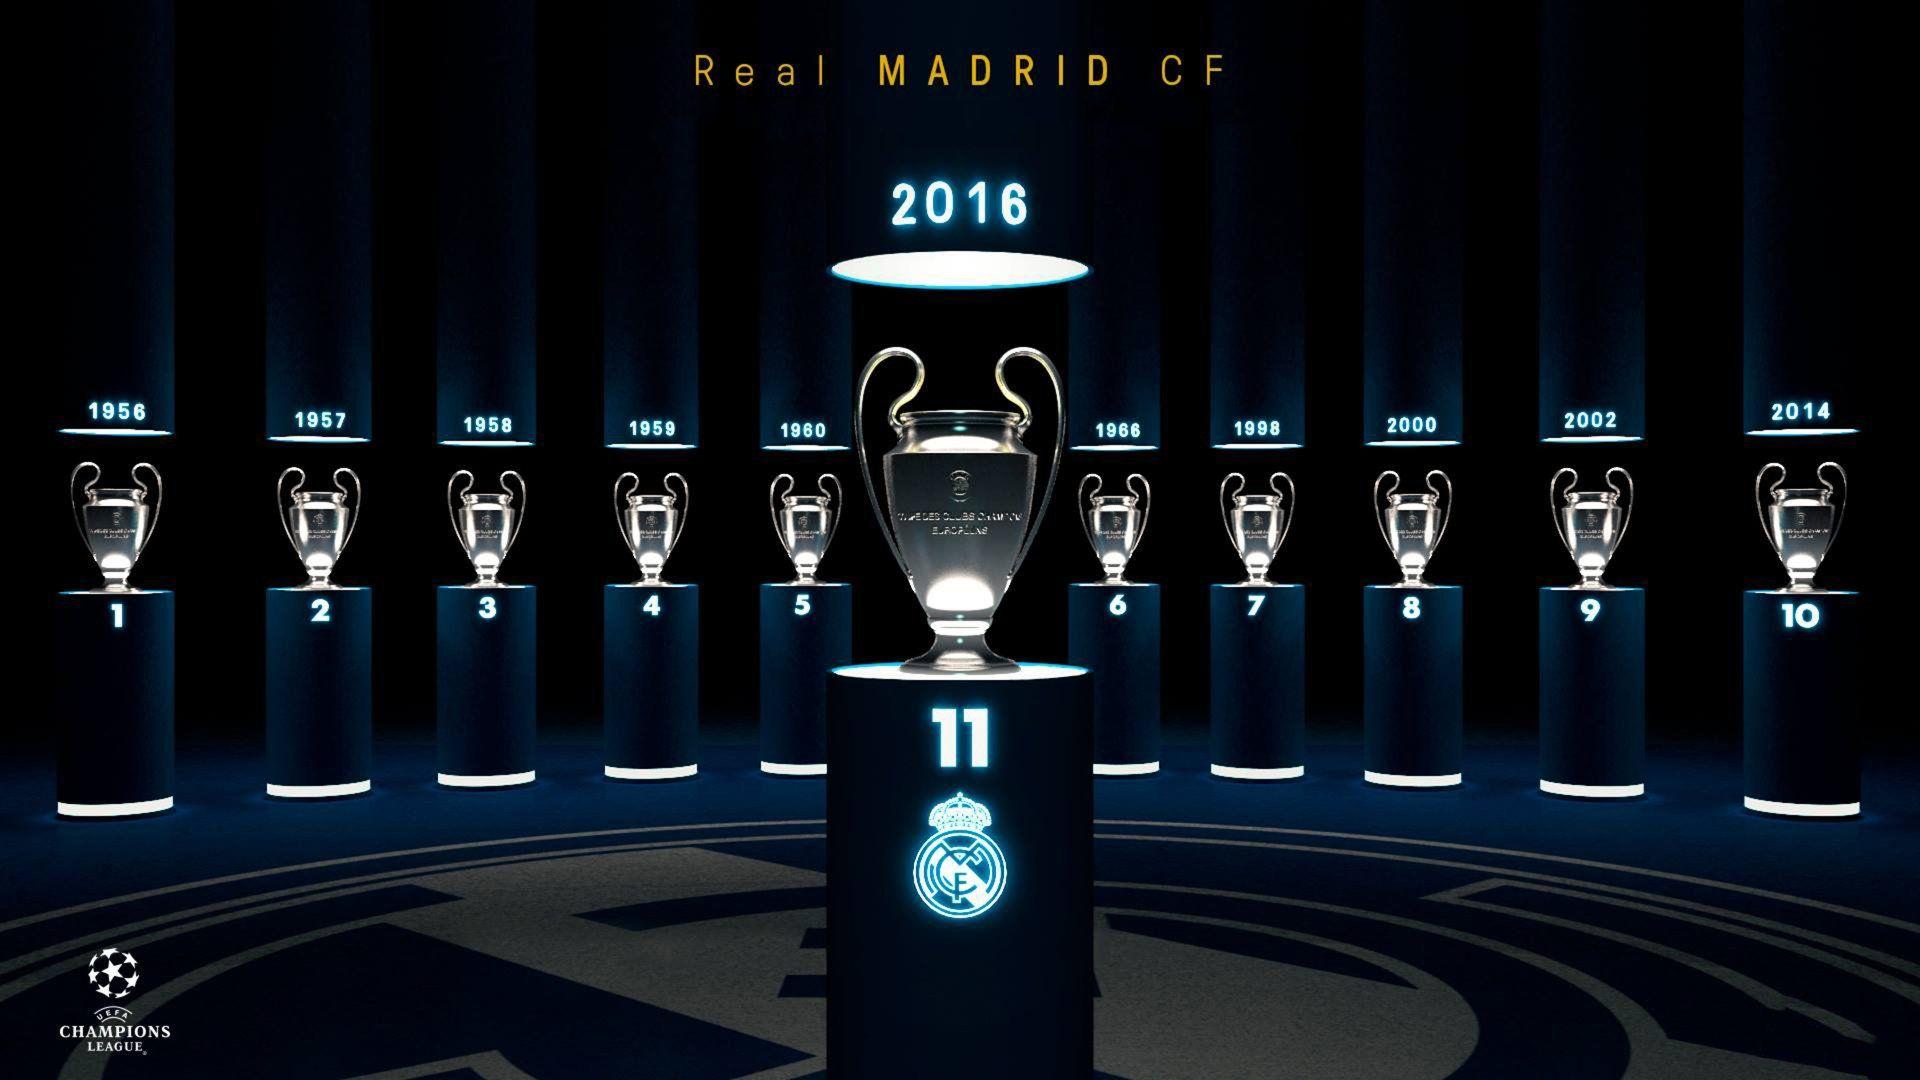 Real Madrid Wallpaper Hd 2019 Hd Football In 2020 Real Madrid Wallpapers Madrid Wallpaper Real Madrid